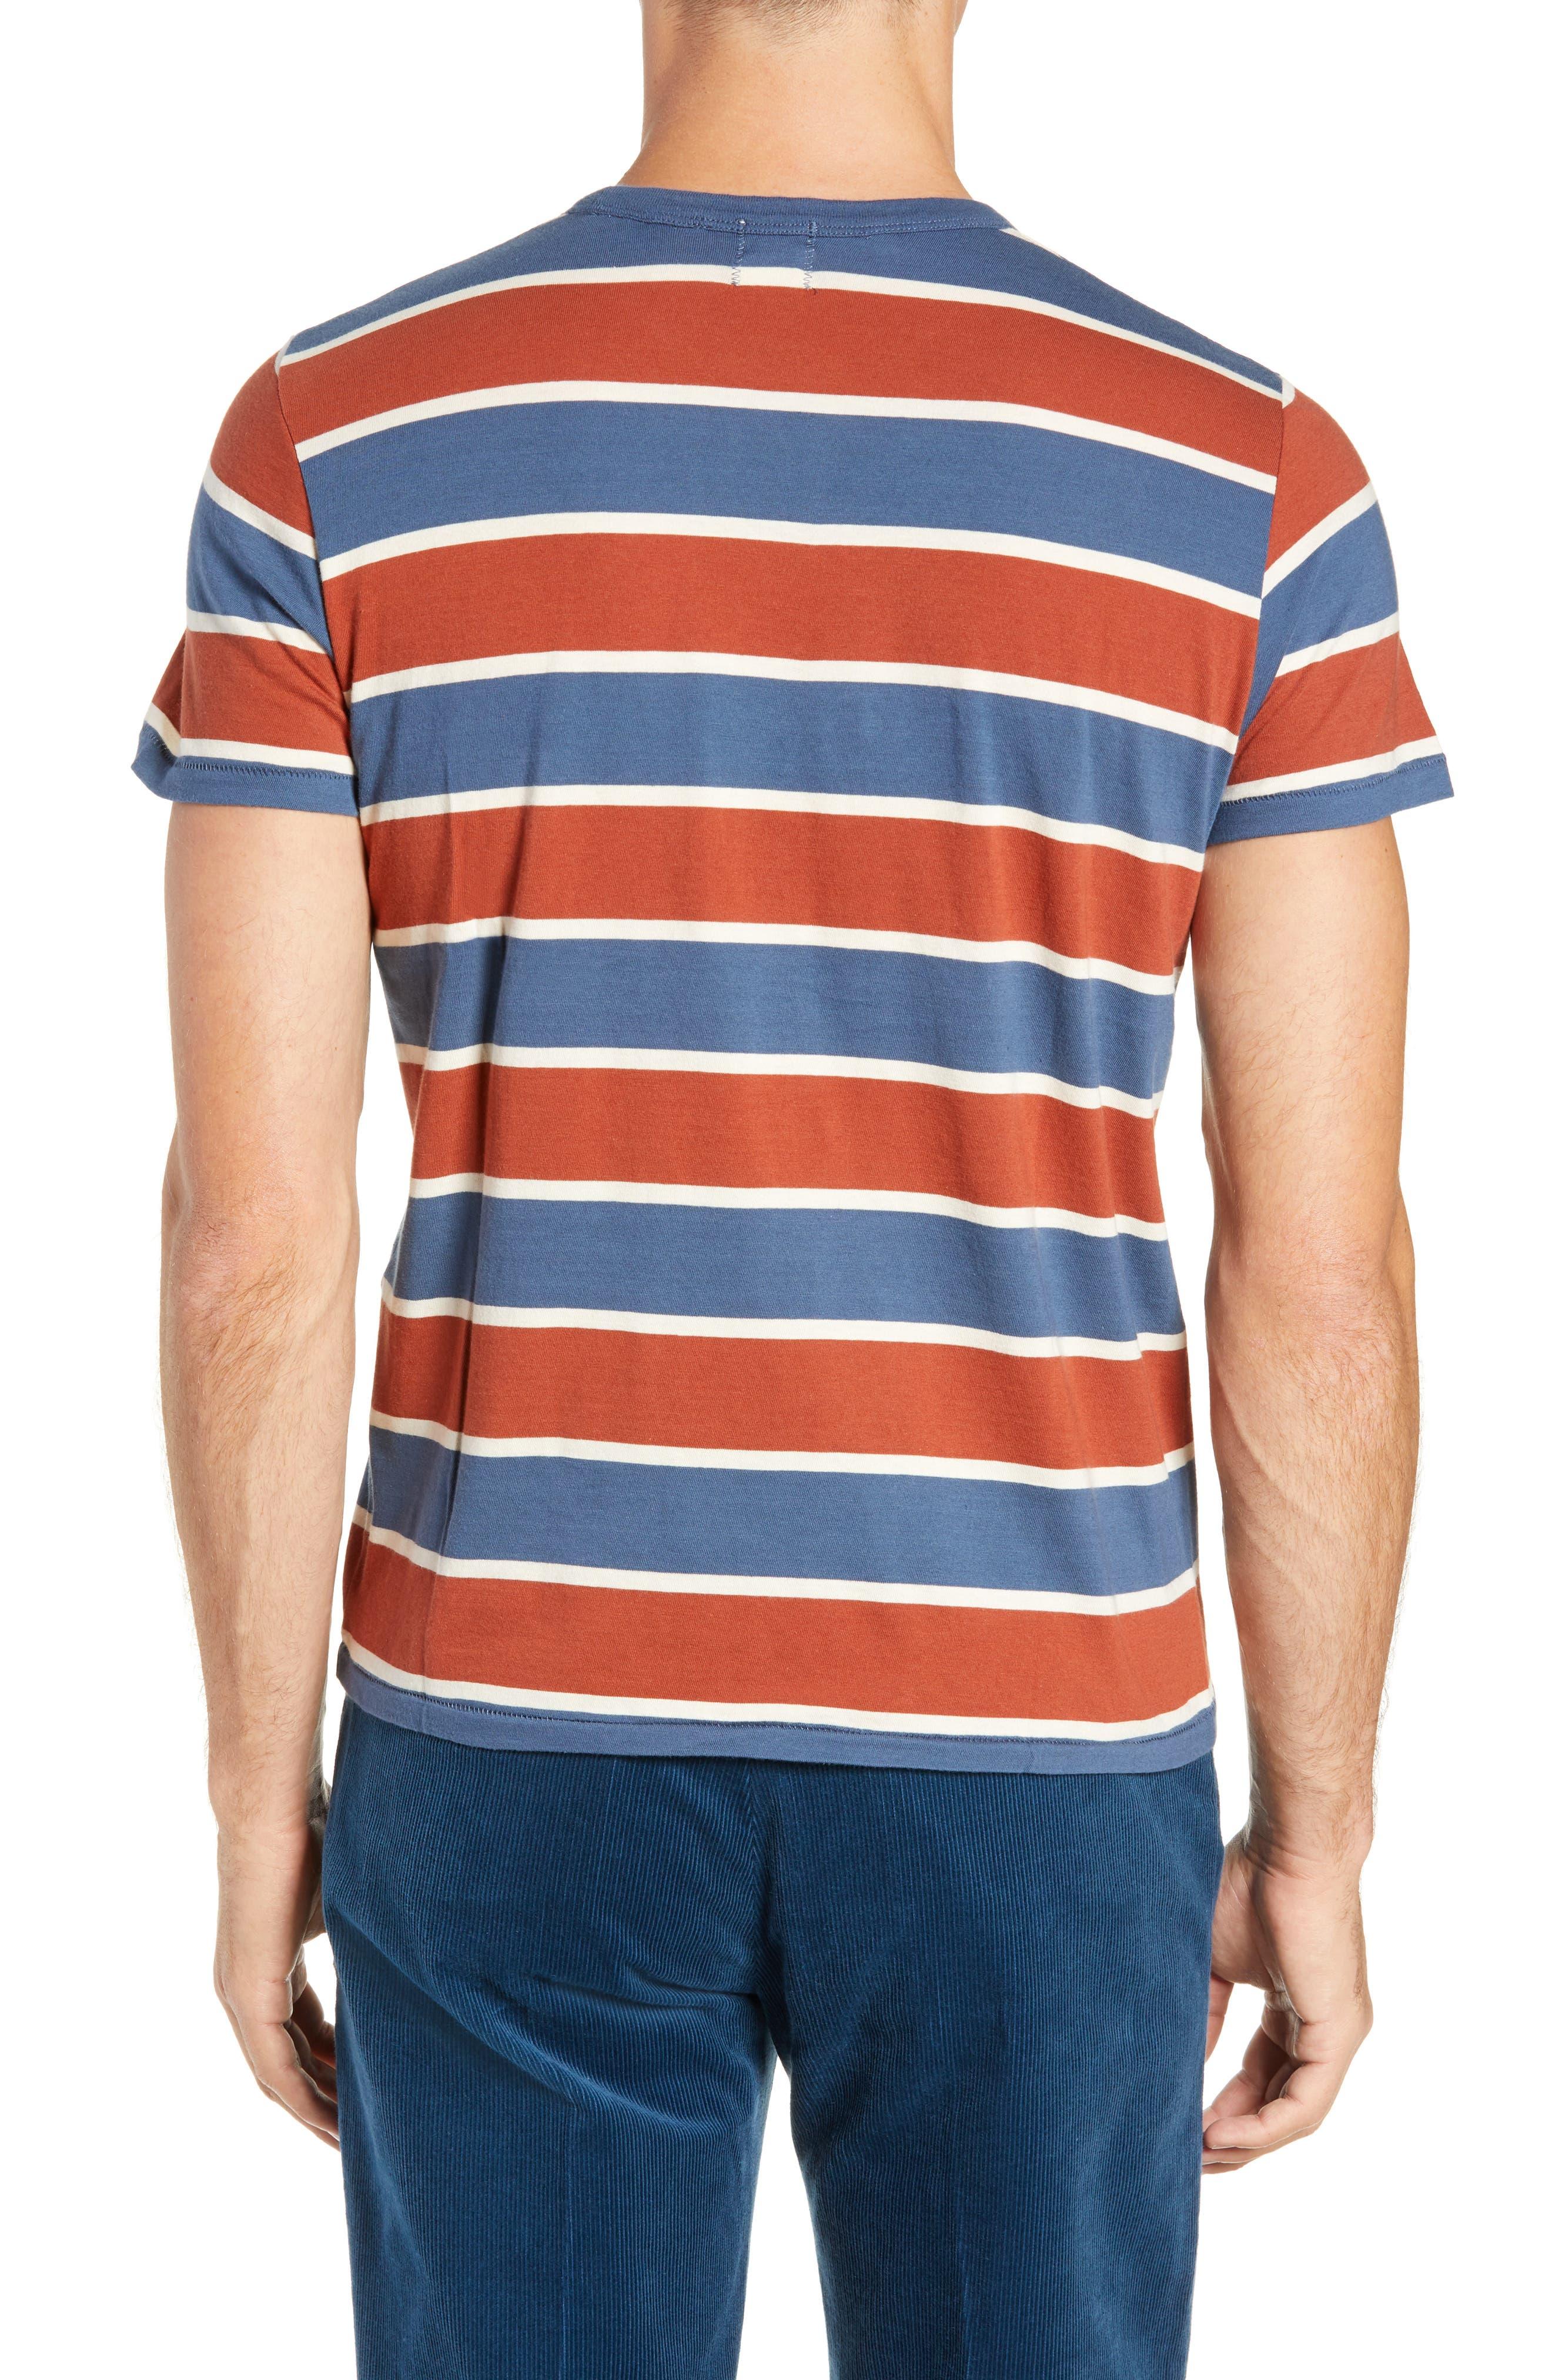 1960s Slim Fit Stripe T-Shirt,                             Alternate thumbnail 2, color,                             DARK DENIM MULTI STRIPE